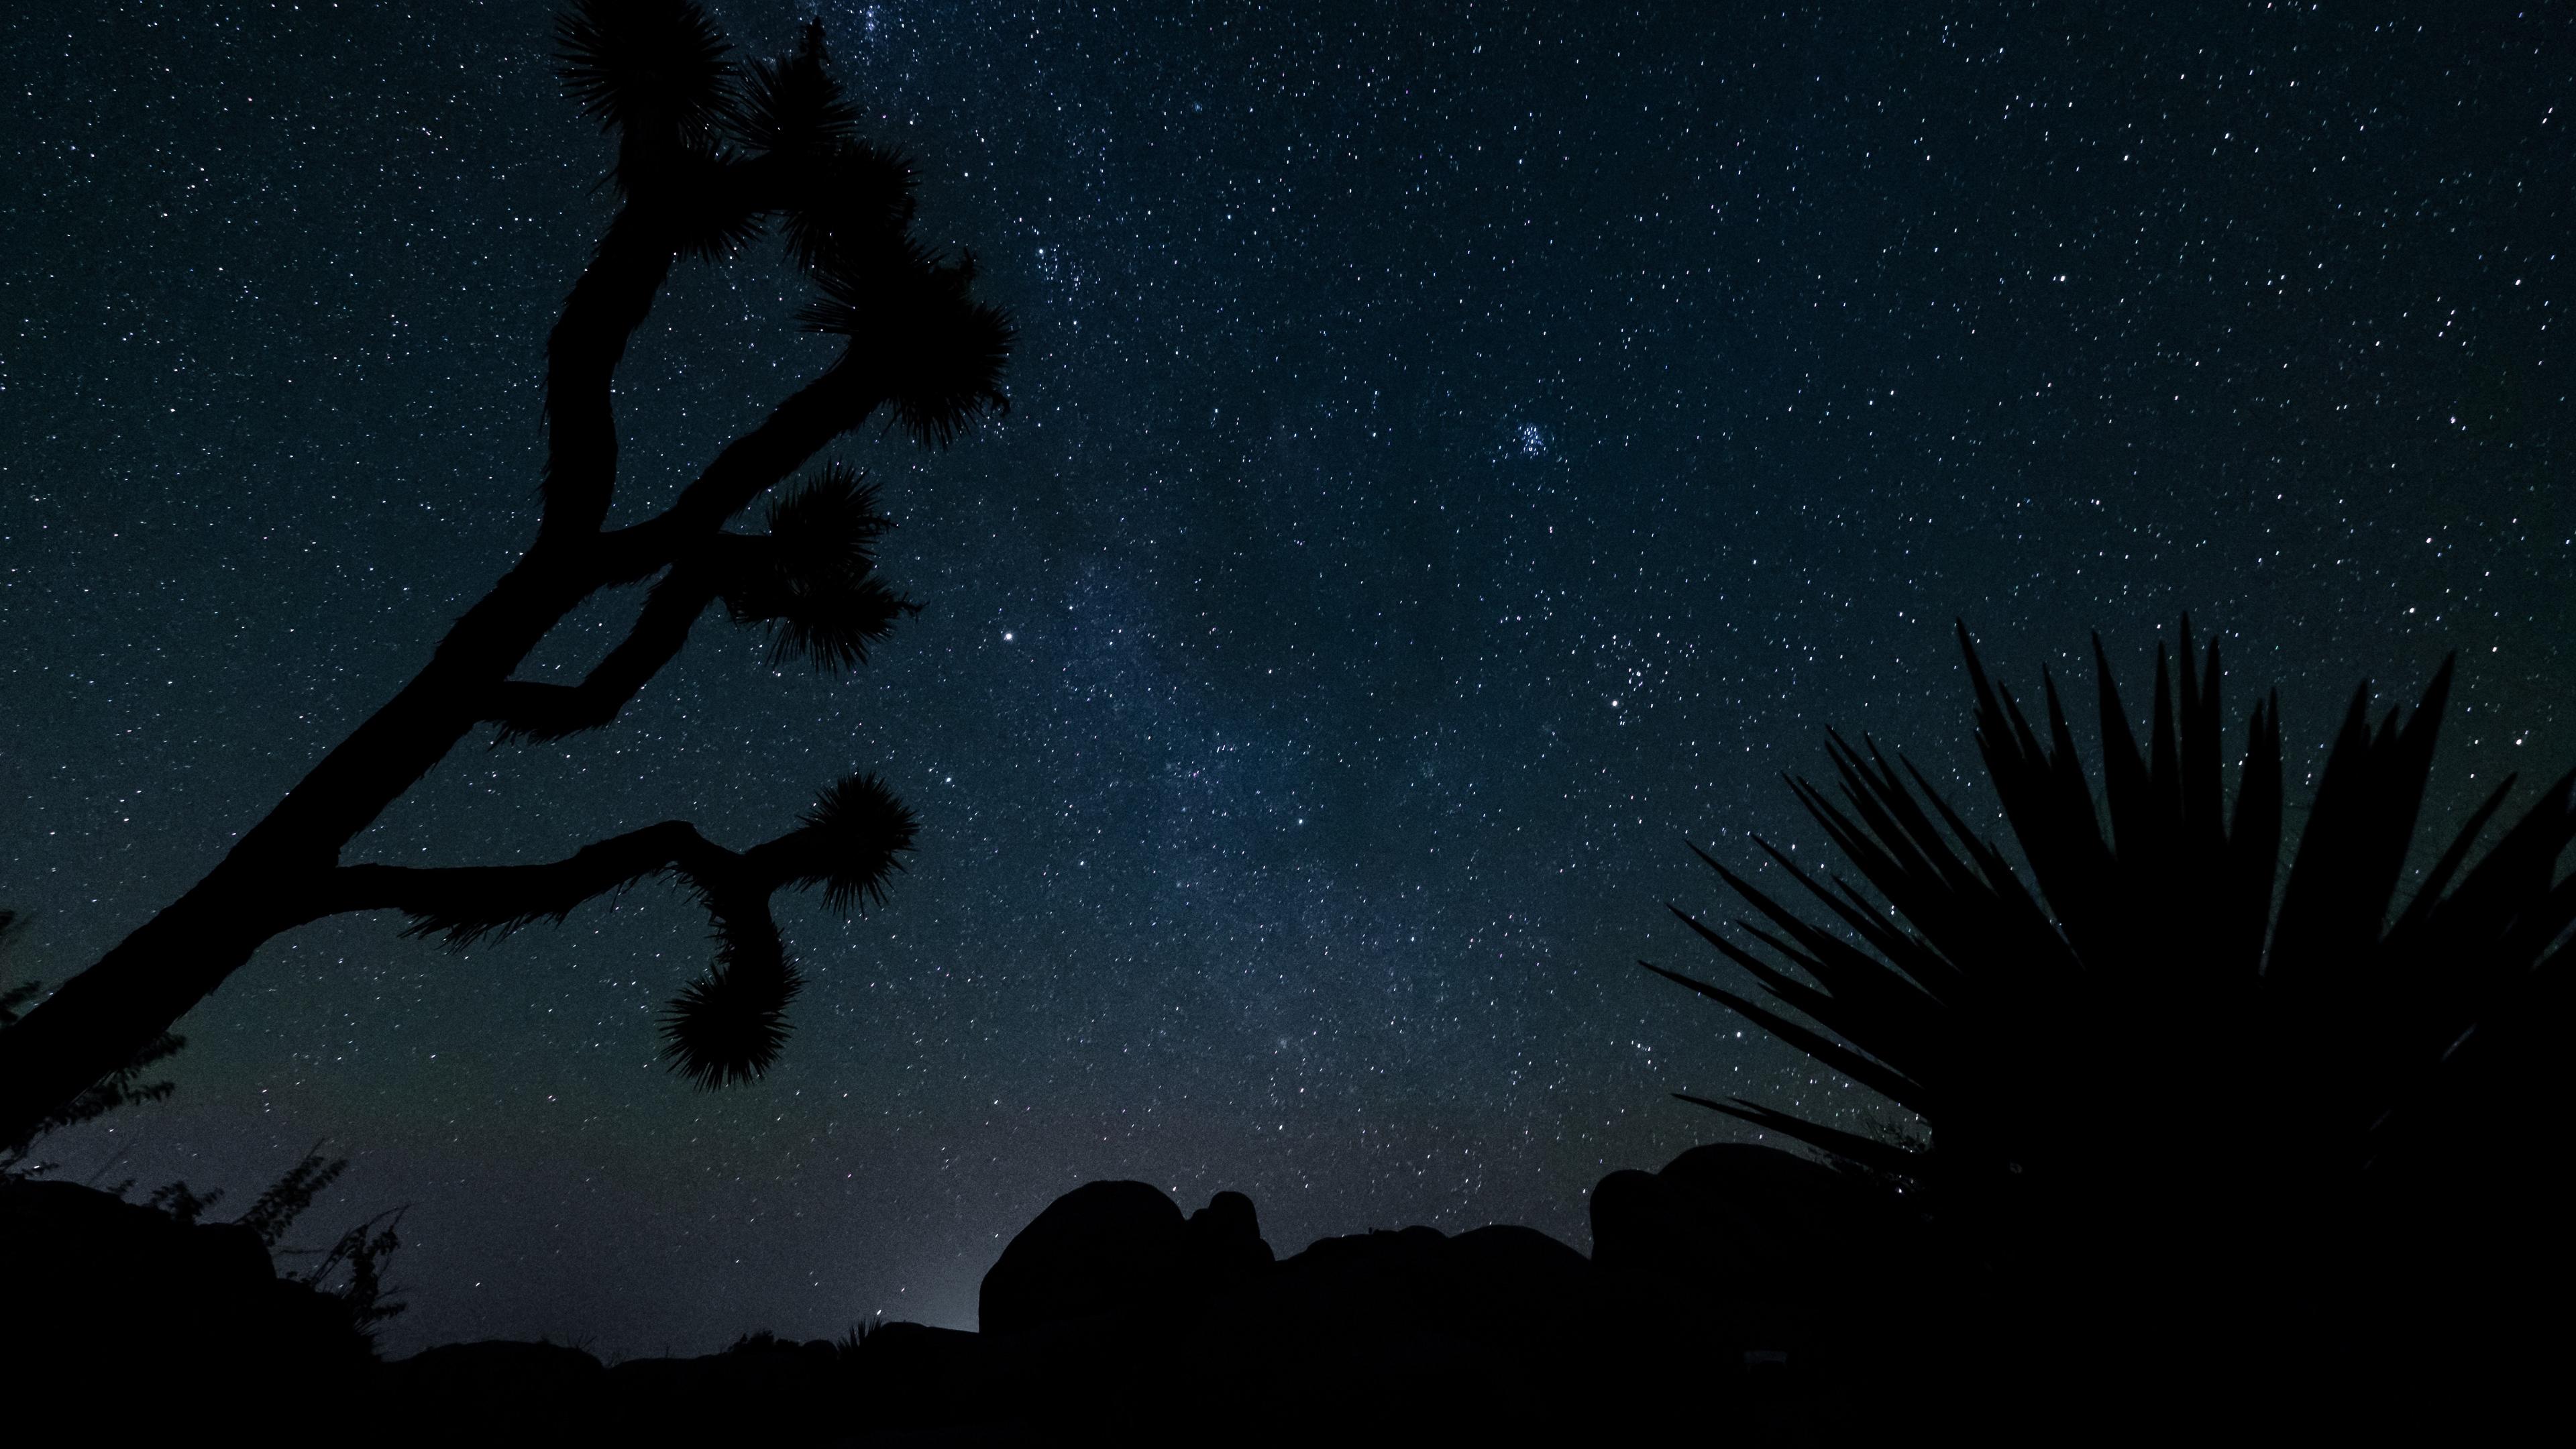 starry sky stars space 4k 1536013927 - starry sky, stars, space 4k - Stars, starry sky, Space